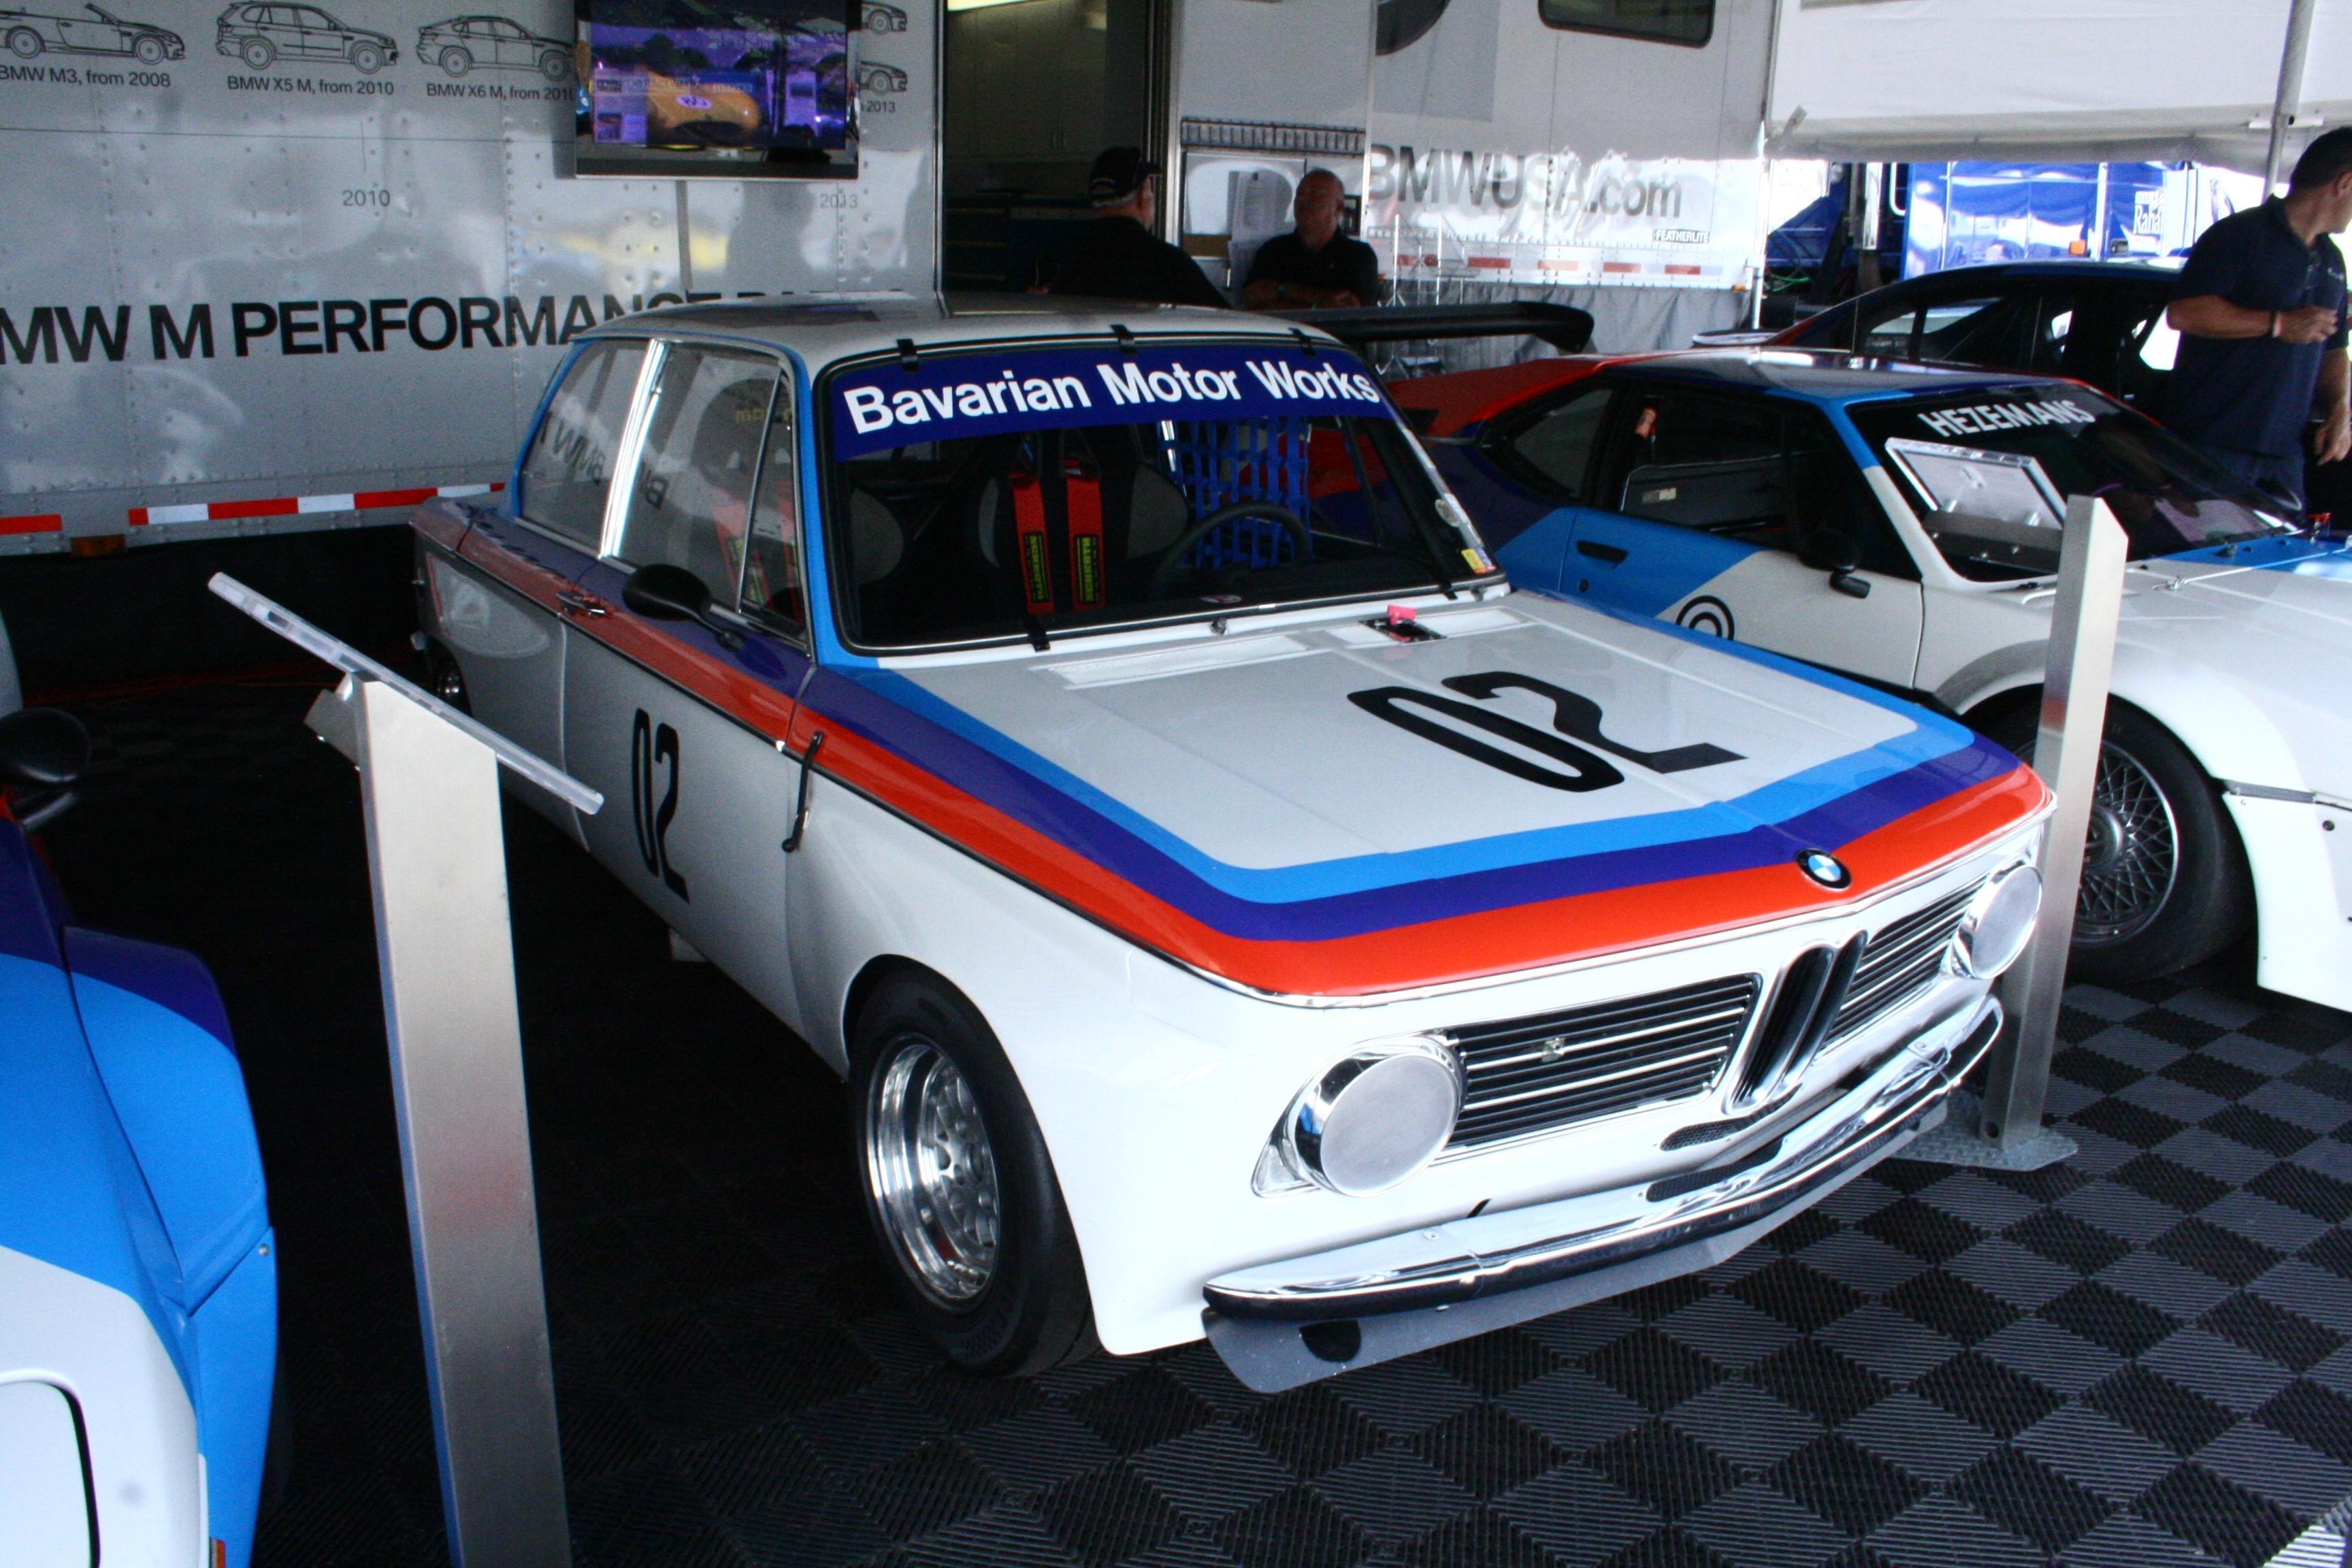 General 3456x2304 car BMW white cars vehicle BMW 02 Series